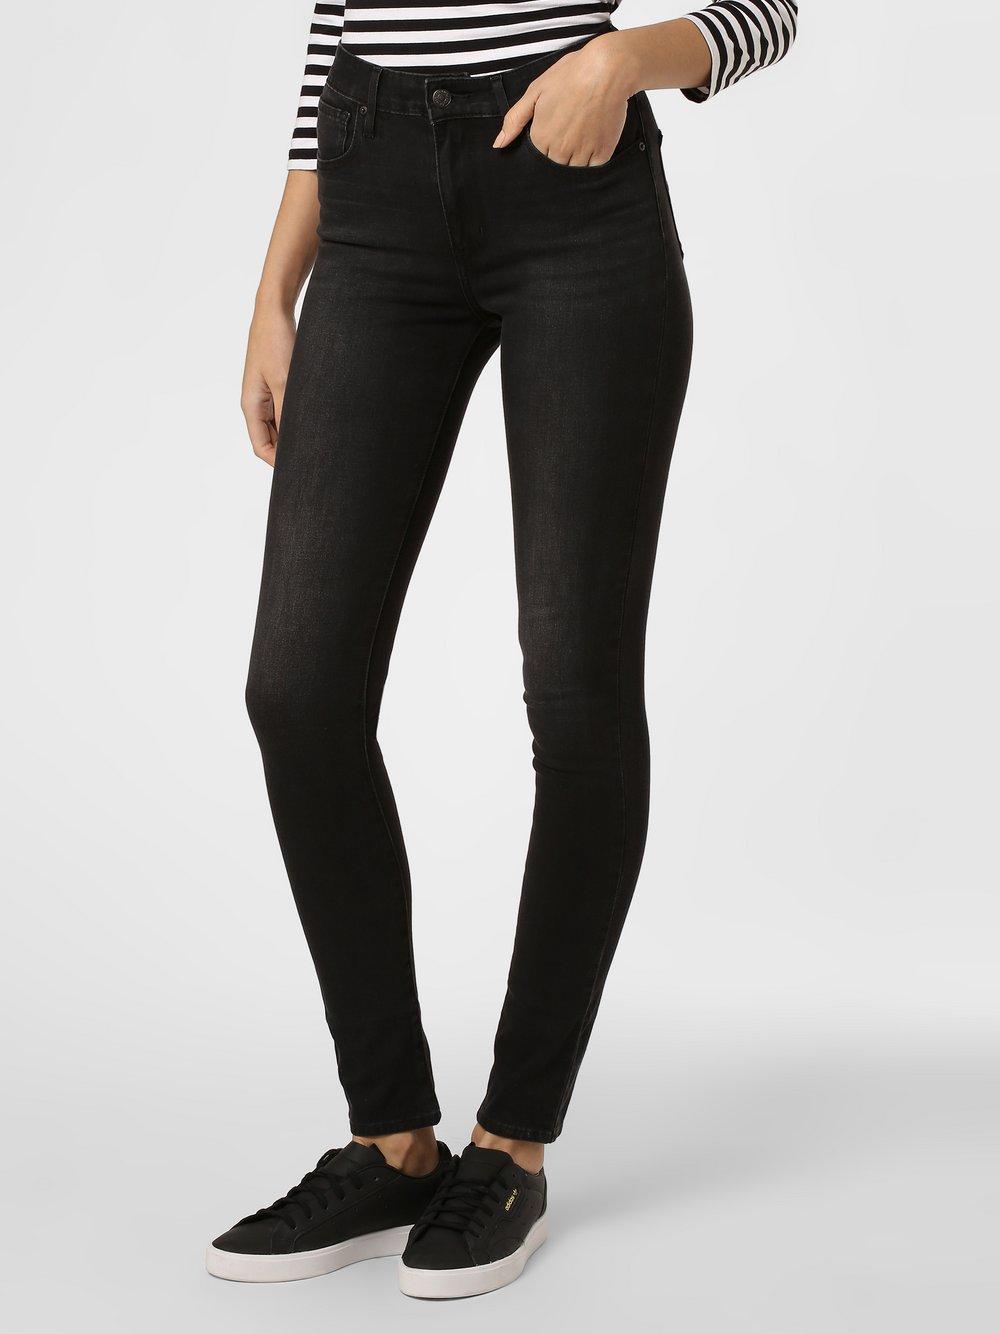 Levi's - Spodnie damskie – 721™ High-Rise Skinny, szary